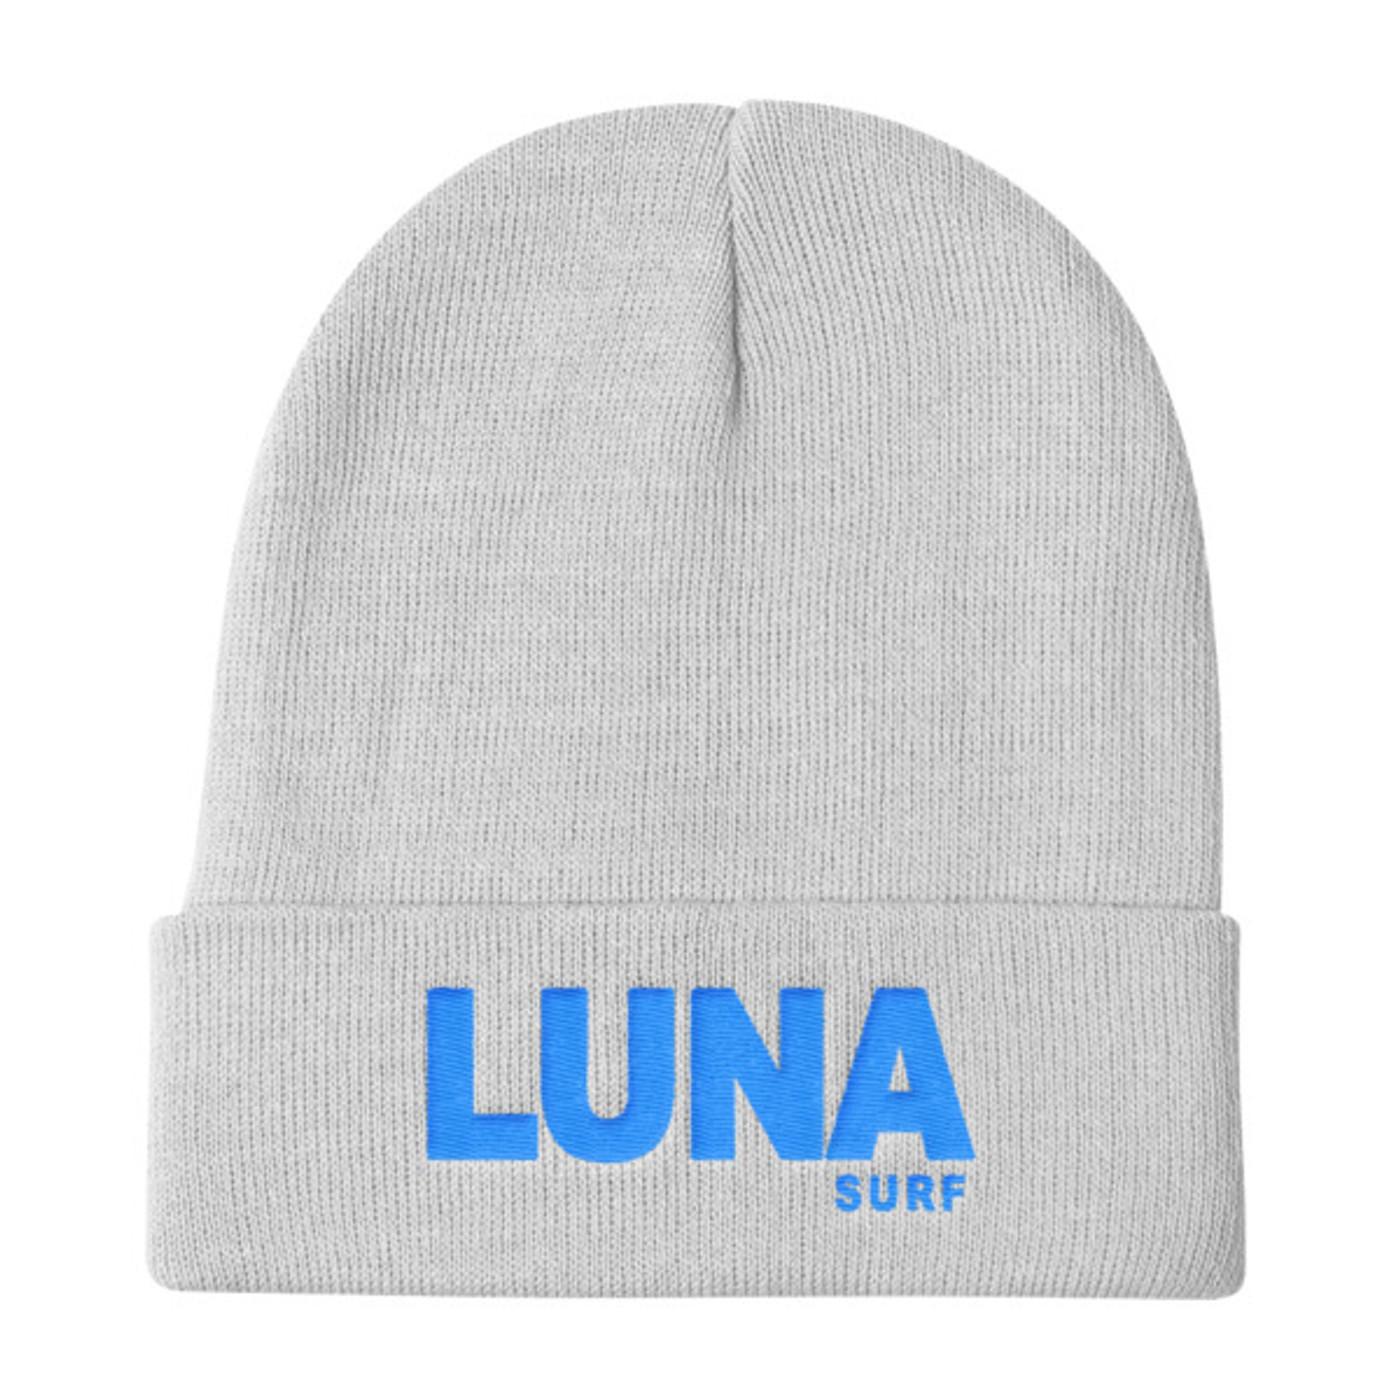 Luna text Electric Blue Knit Beanie